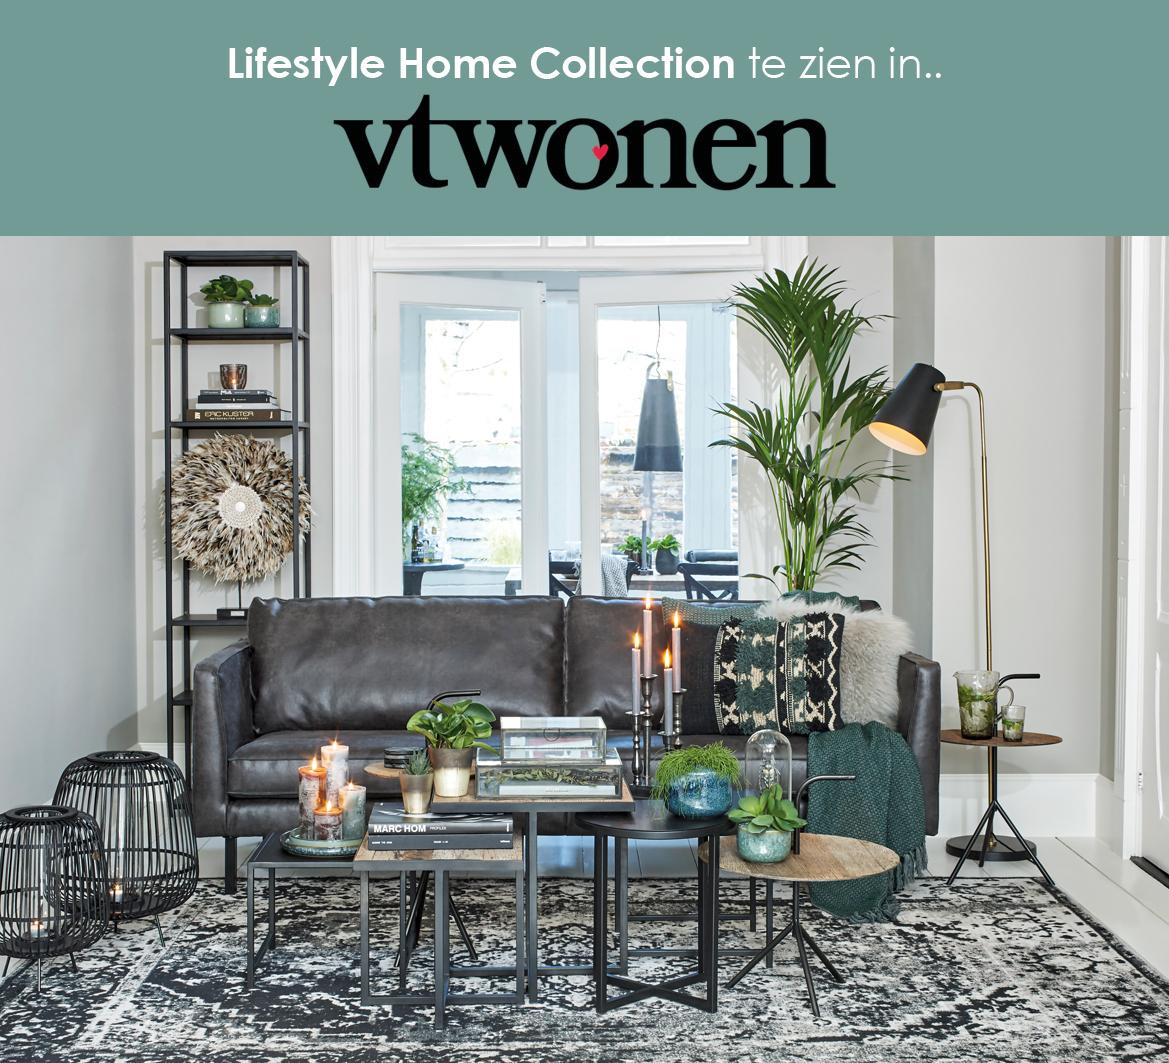 gezien in vt wonen lifestyle home collection. Black Bedroom Furniture Sets. Home Design Ideas